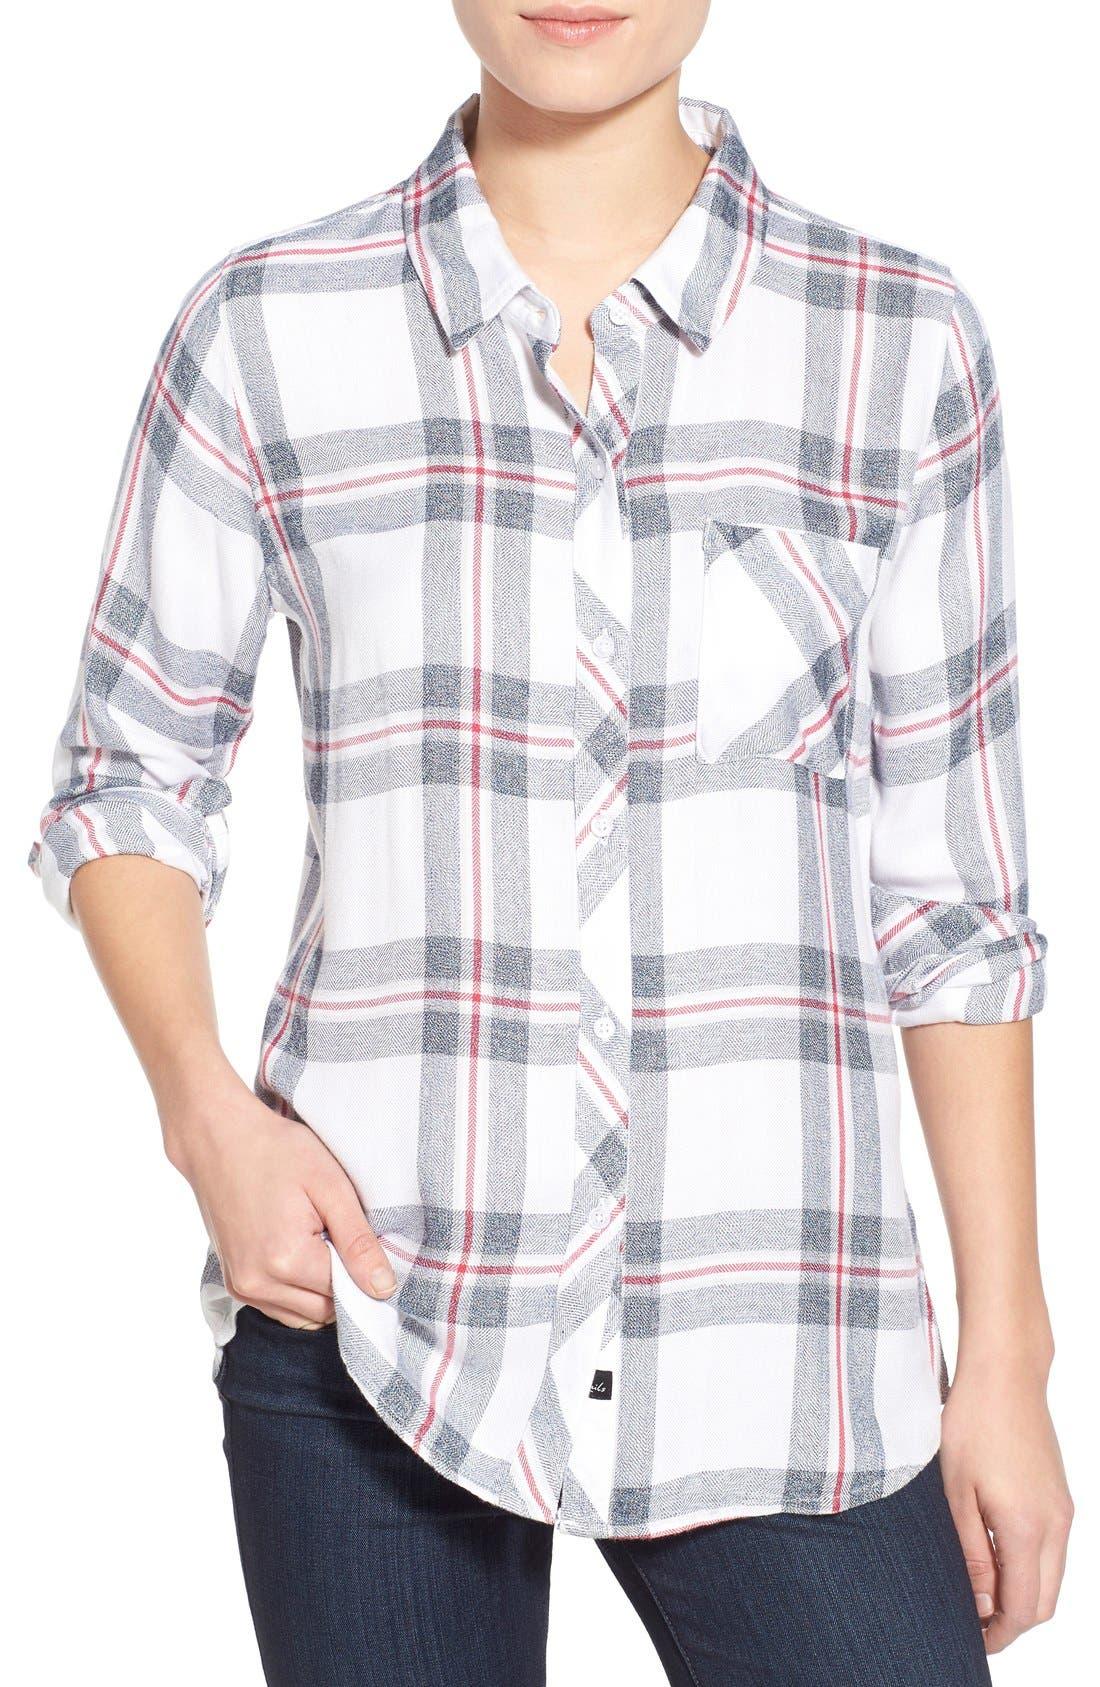 'Hunter' Plaid Shirt, Main, color, 112